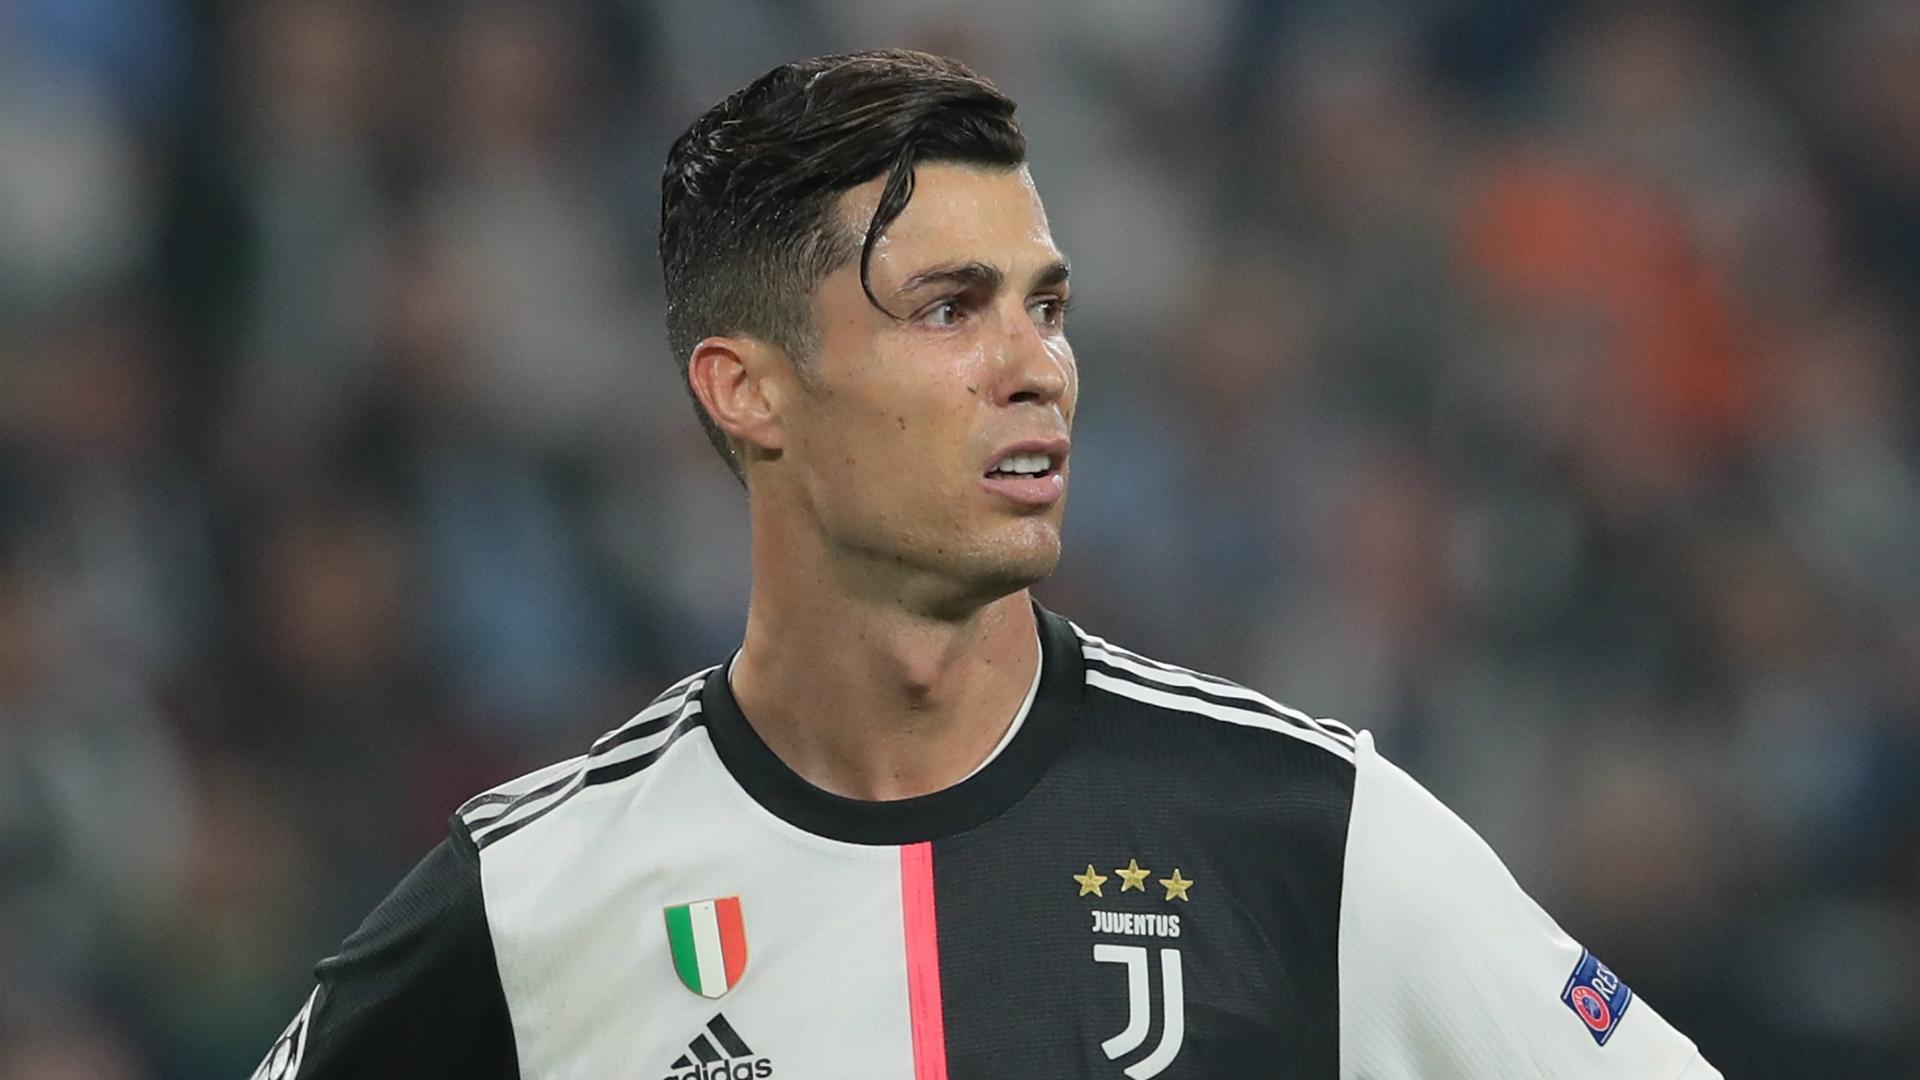 Cristiano Ronaldo injury 'not a big issue' – Sarri